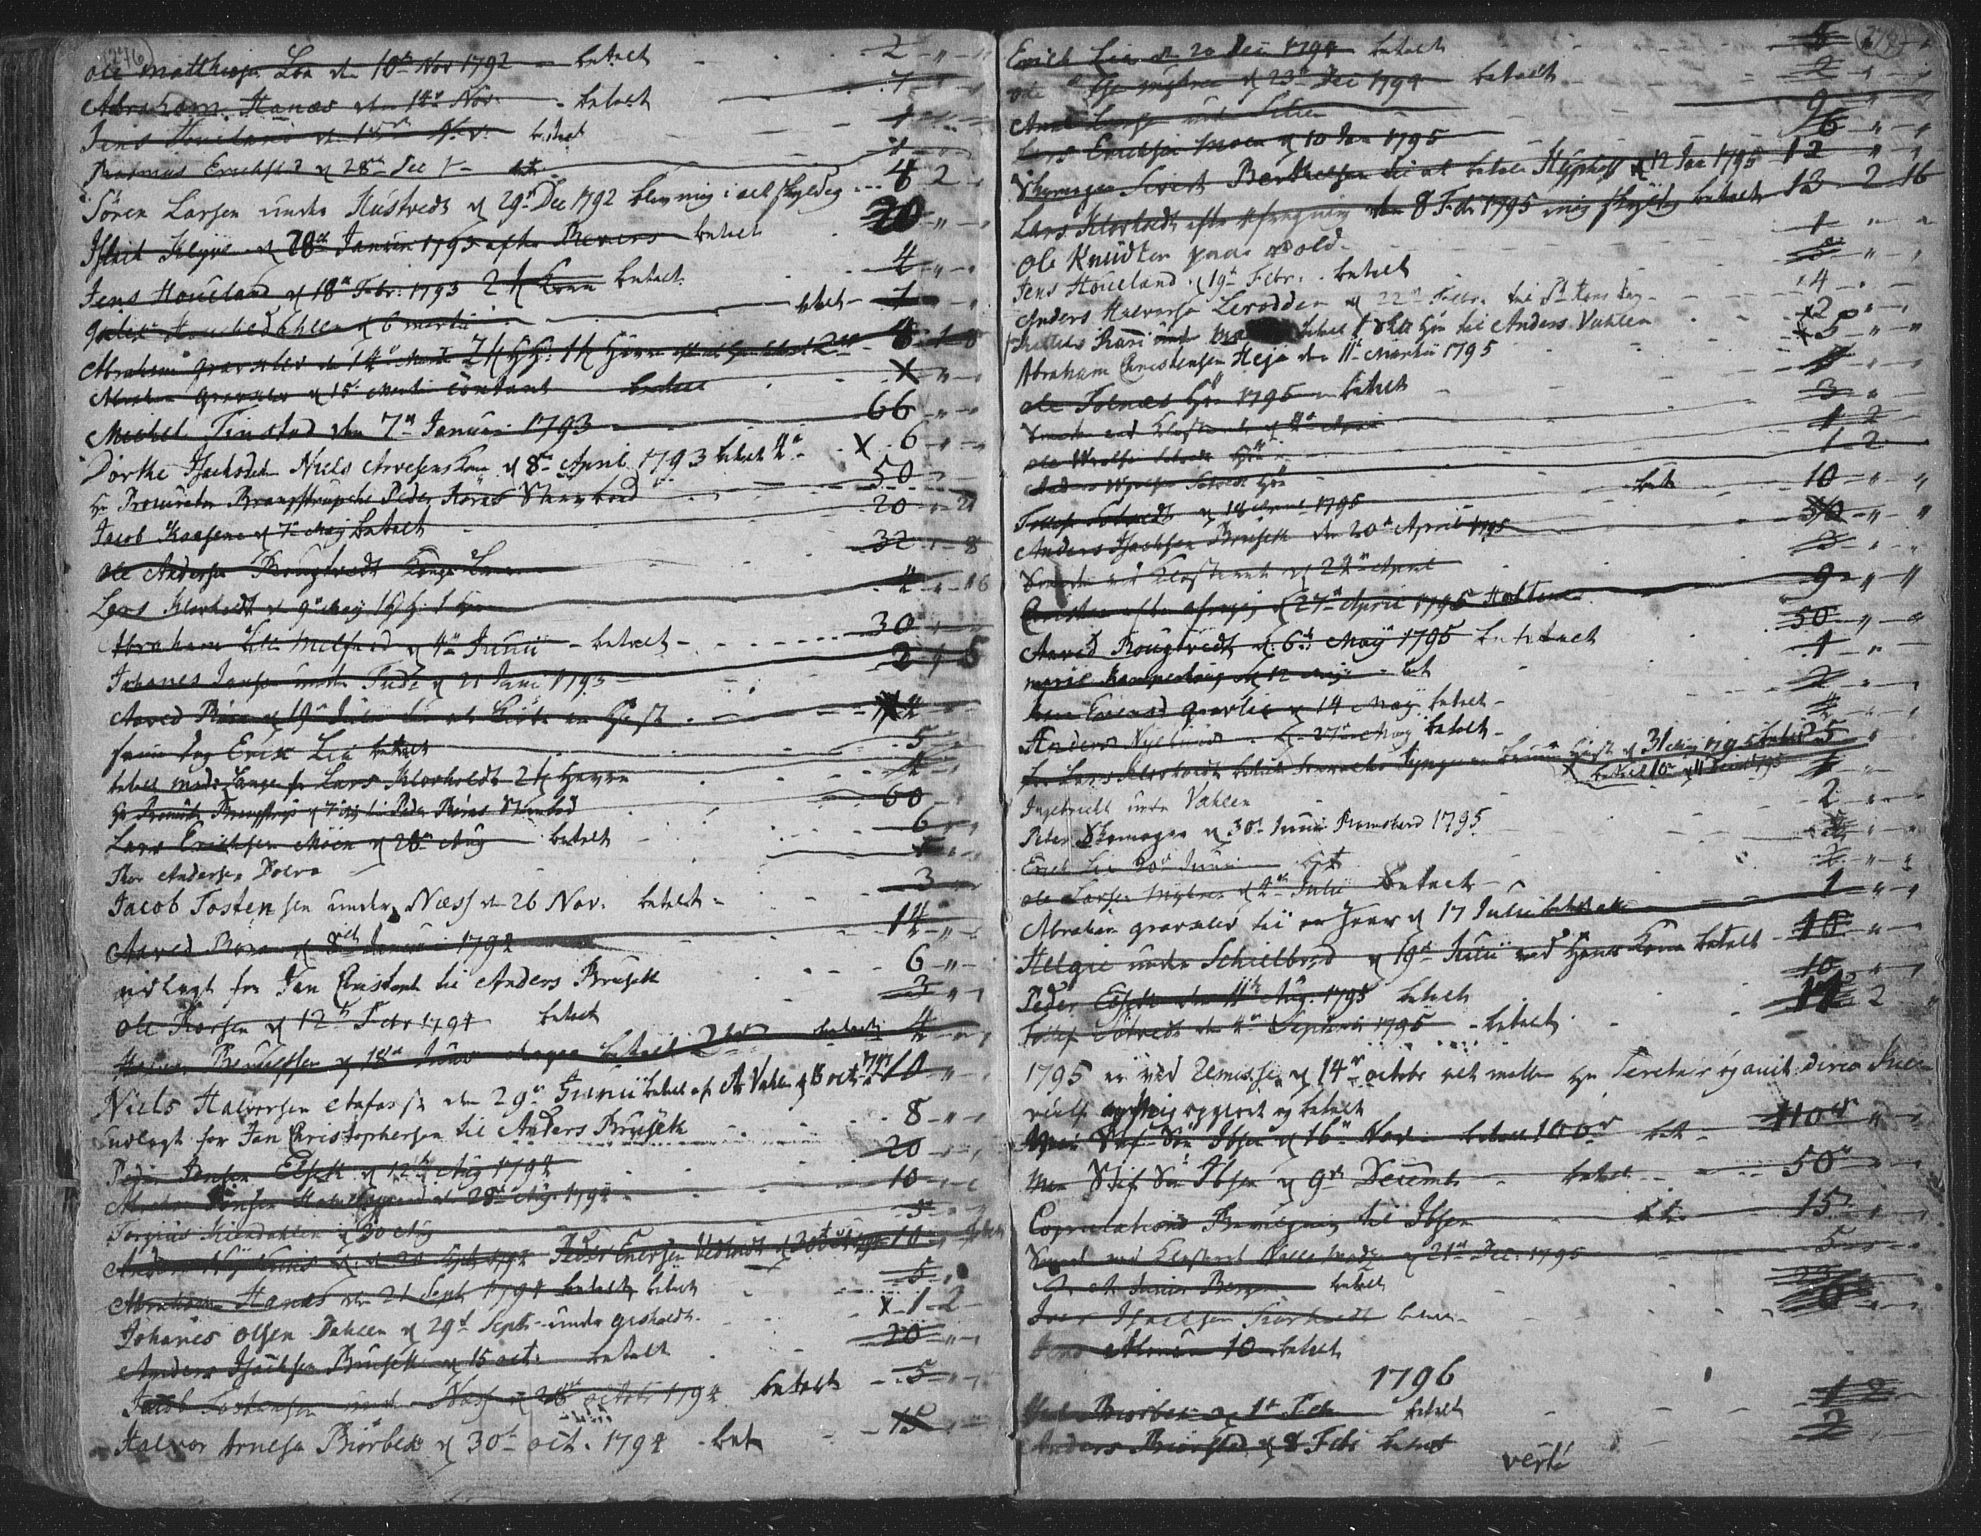 SAKO, Solum kirkebøker, F/Fa/L0003: Ministerialbok nr. I 3, 1761-1814, s. 276-277